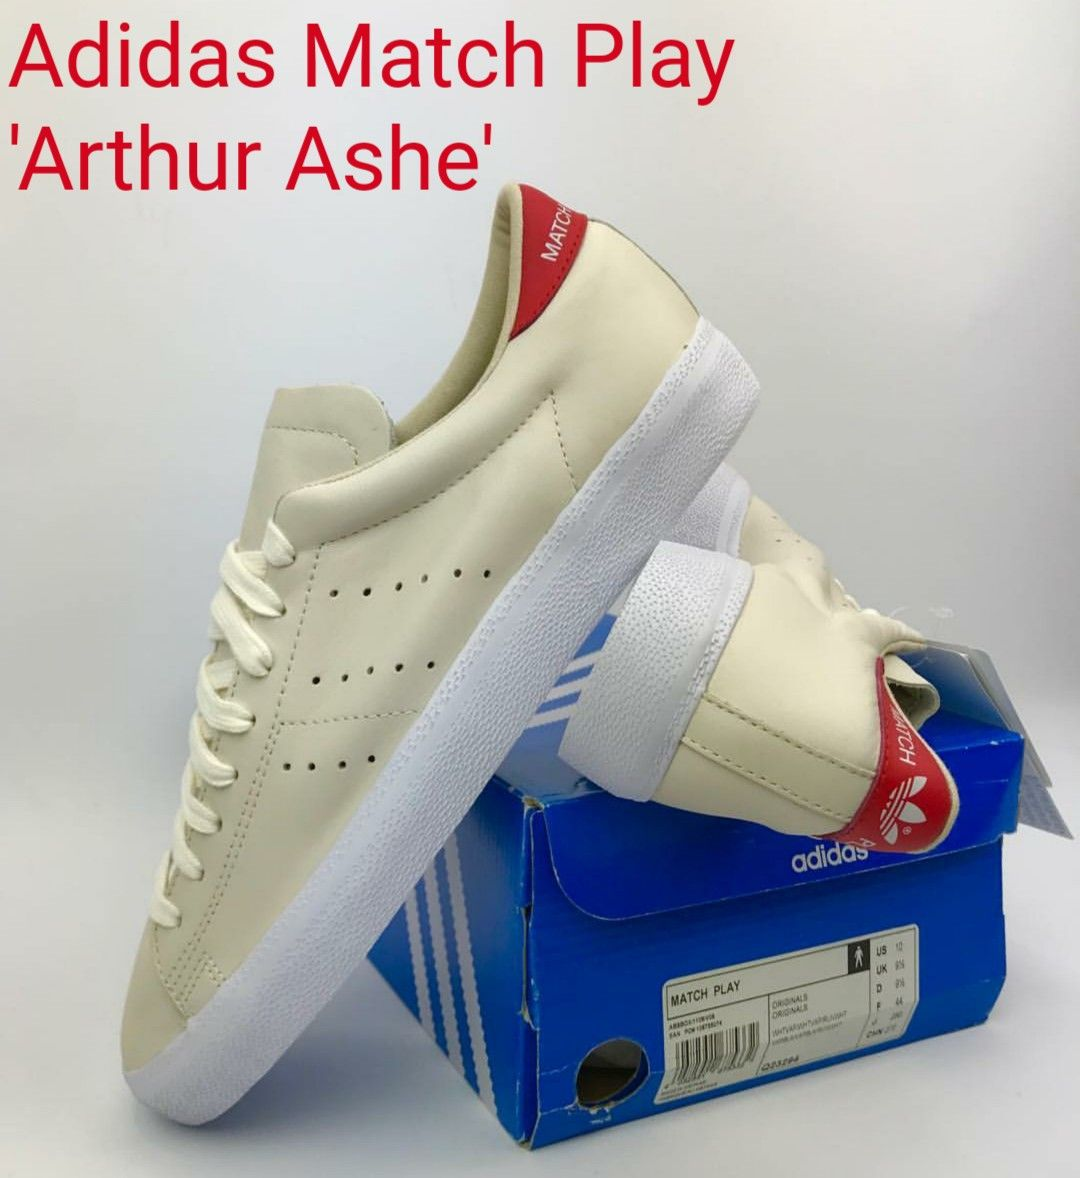 Superb pair of vintage Adidas Match Play 'Arthur Ashe